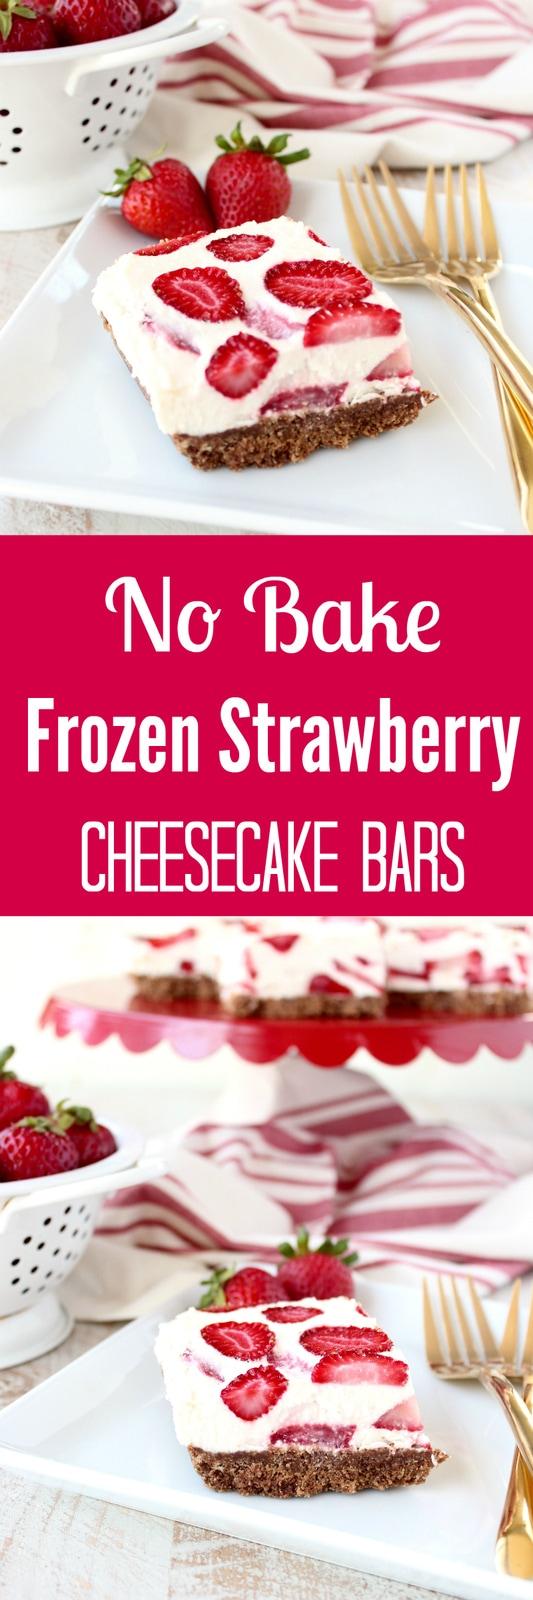 Frozen Strawberry Cheesecake Bars Recipe